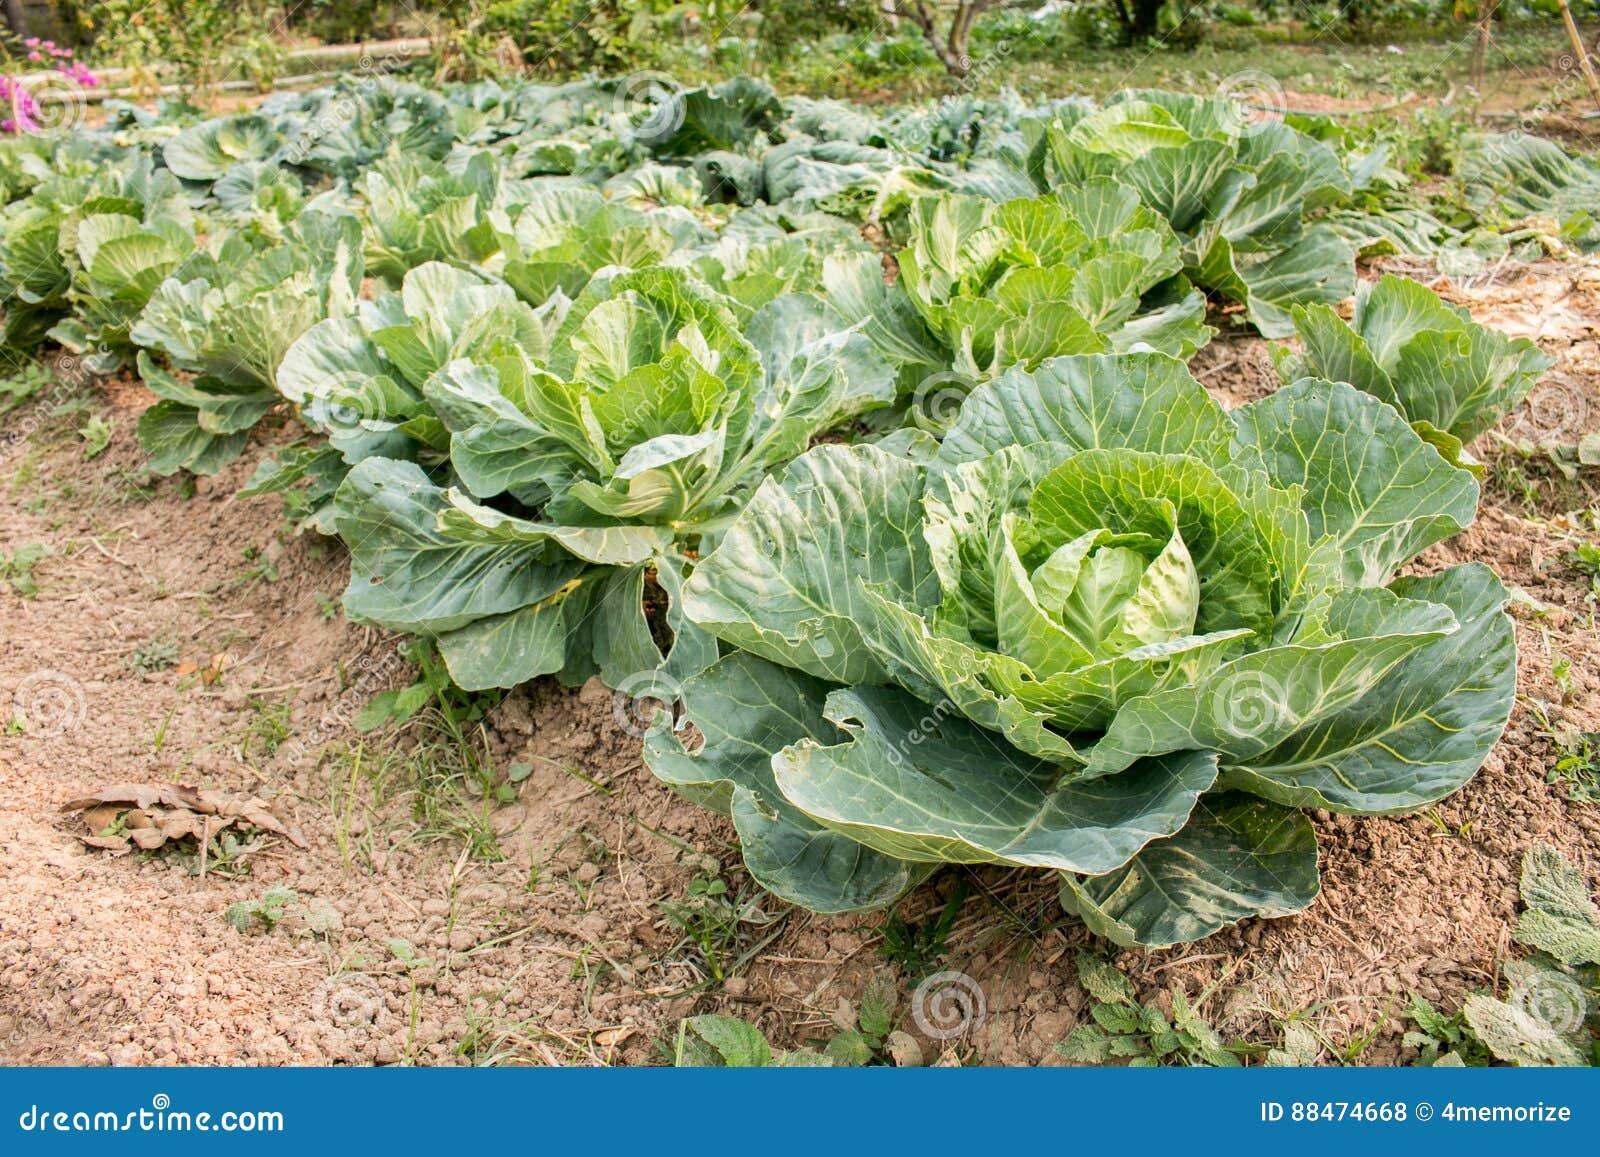 fresh green cabbage, organic vegetables in backyard garden stock